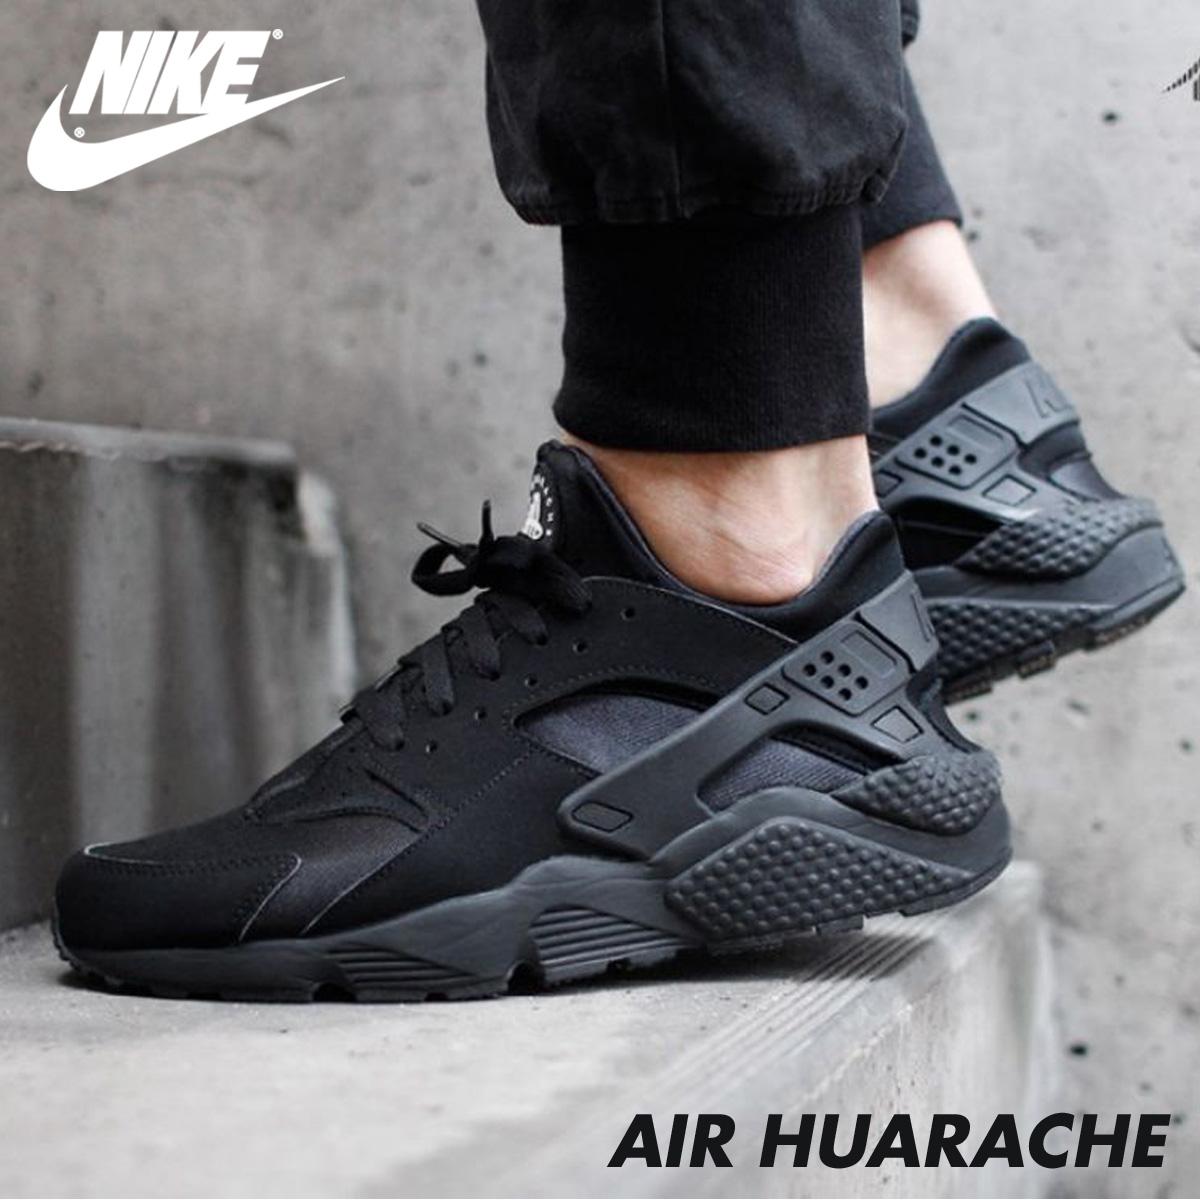 buy popular 17b1d 5c04a ... NIKE ナイキエアハラチスニーカー AIR HUARACHE 318,429-003 men s shoes black  7 8 ...